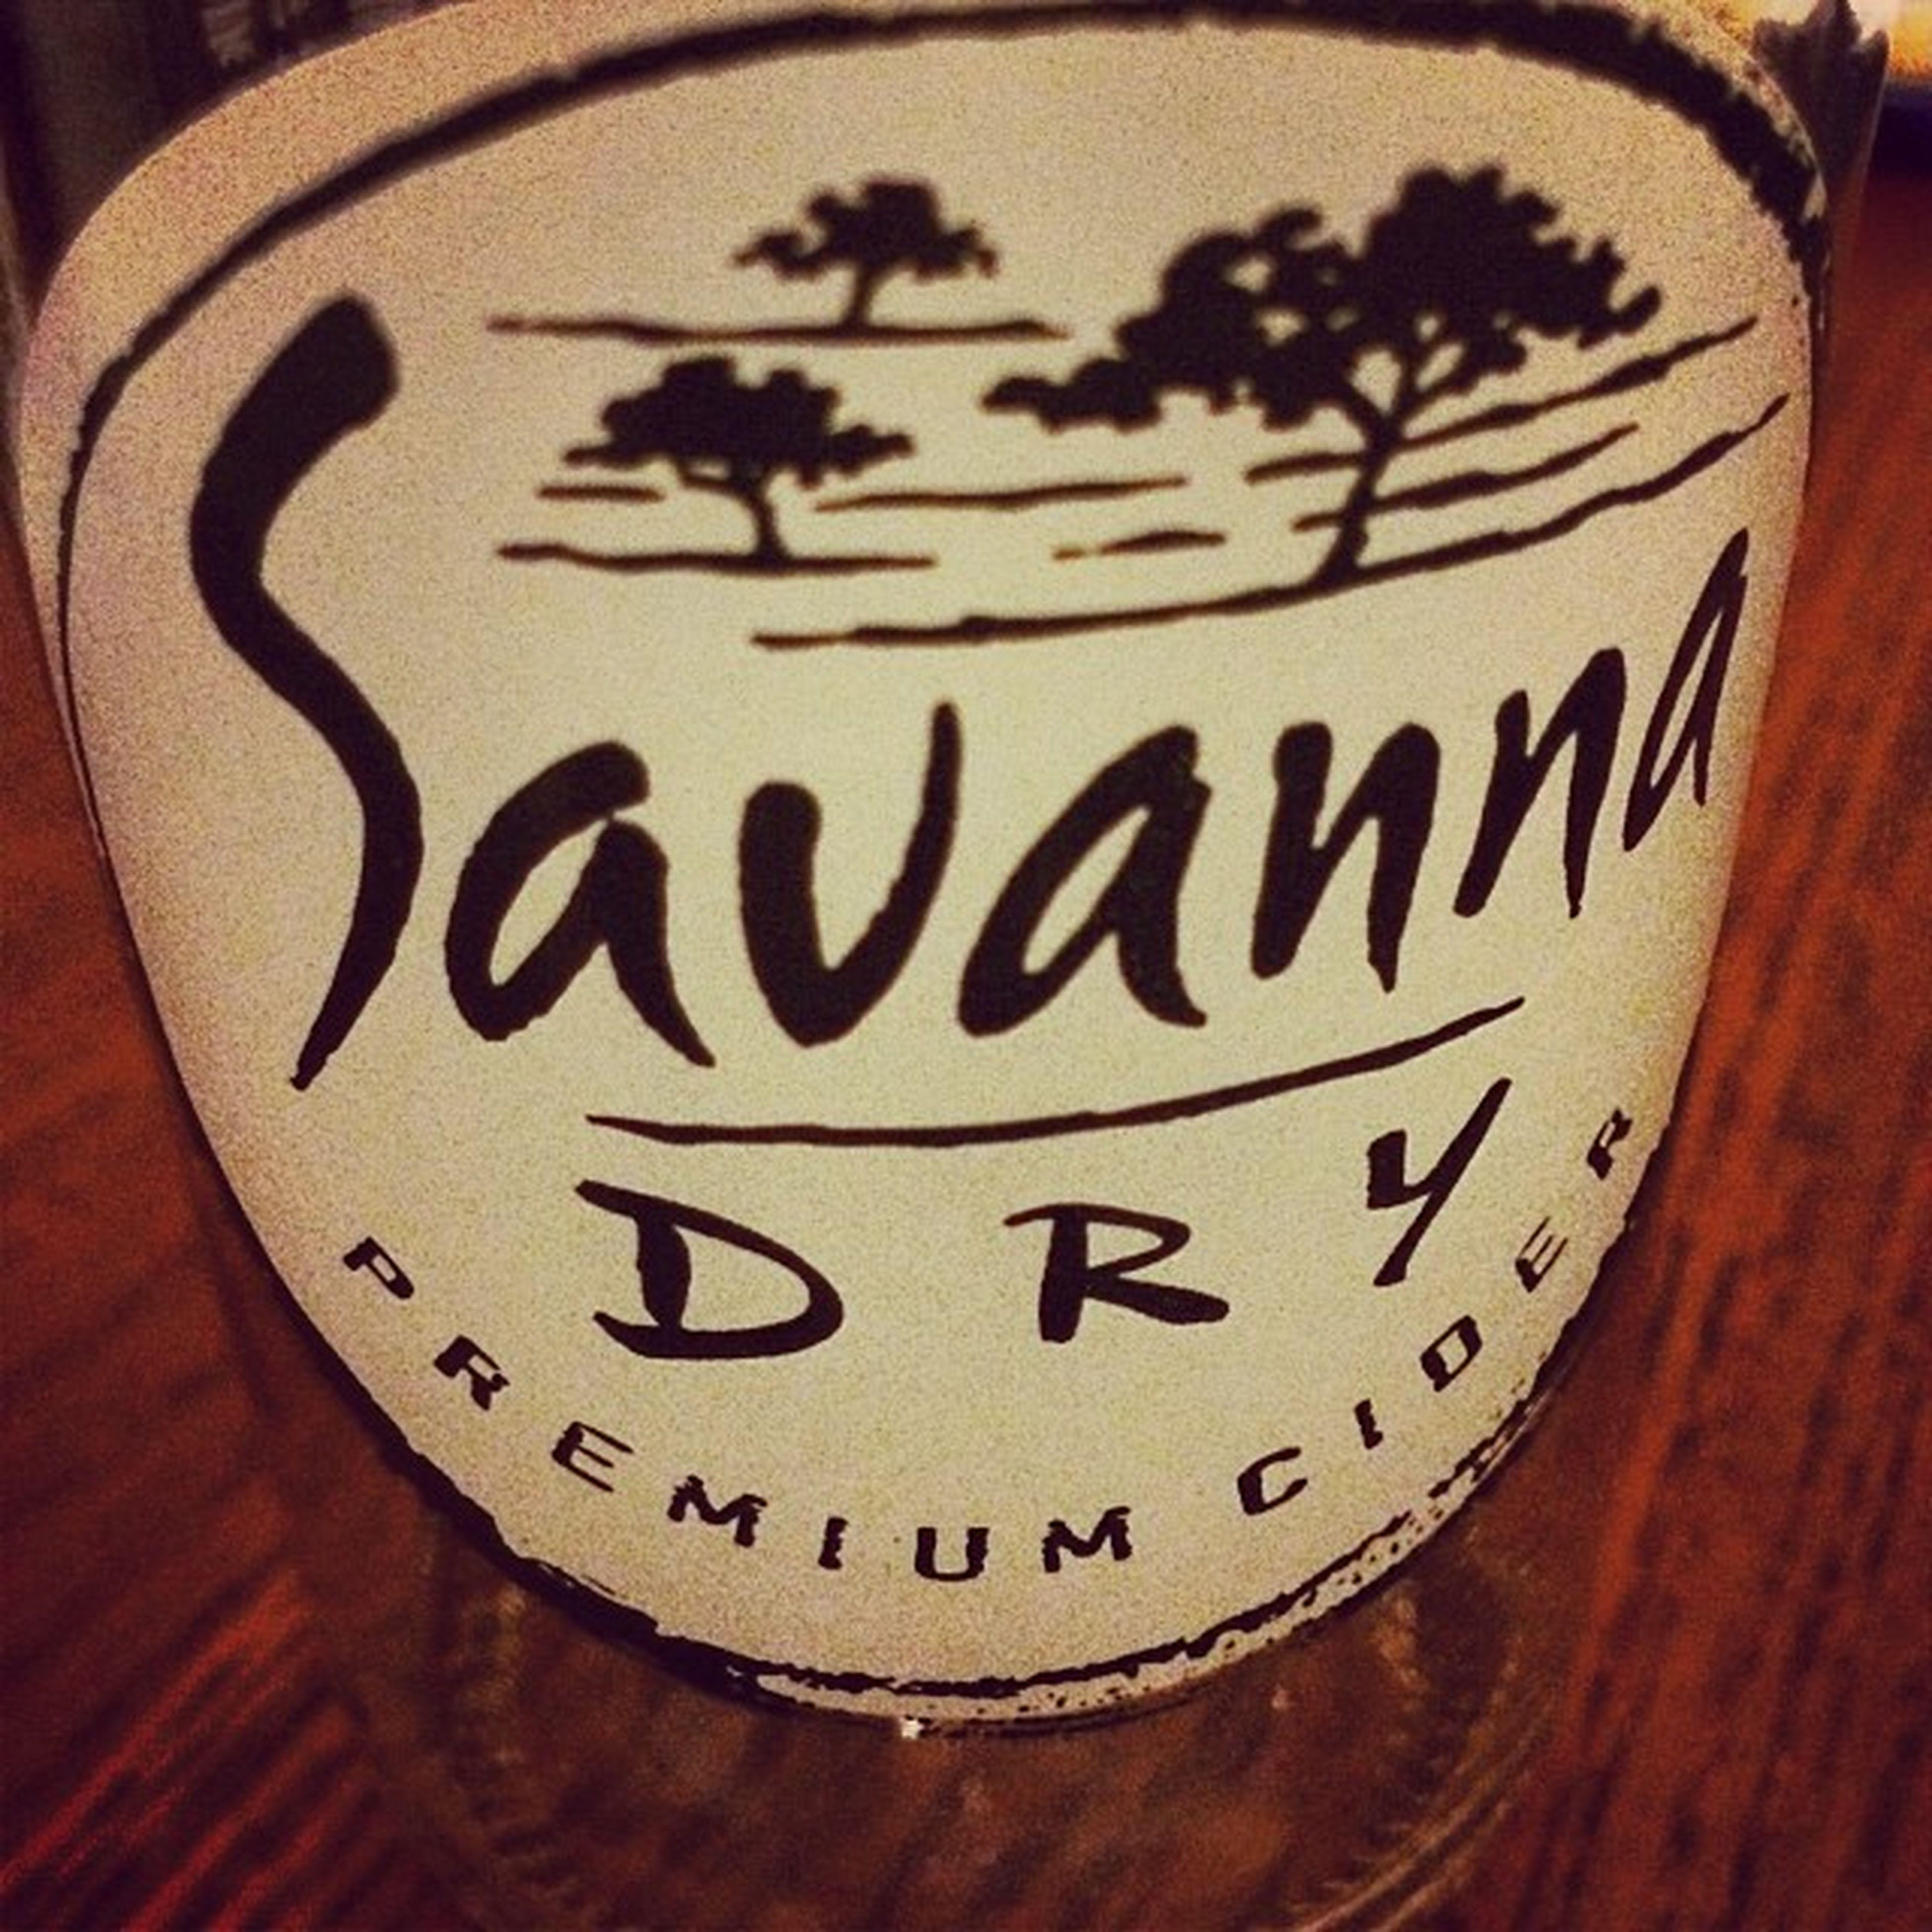 LeiderGeil aber Leiderleer 😉 Cider Savannadry